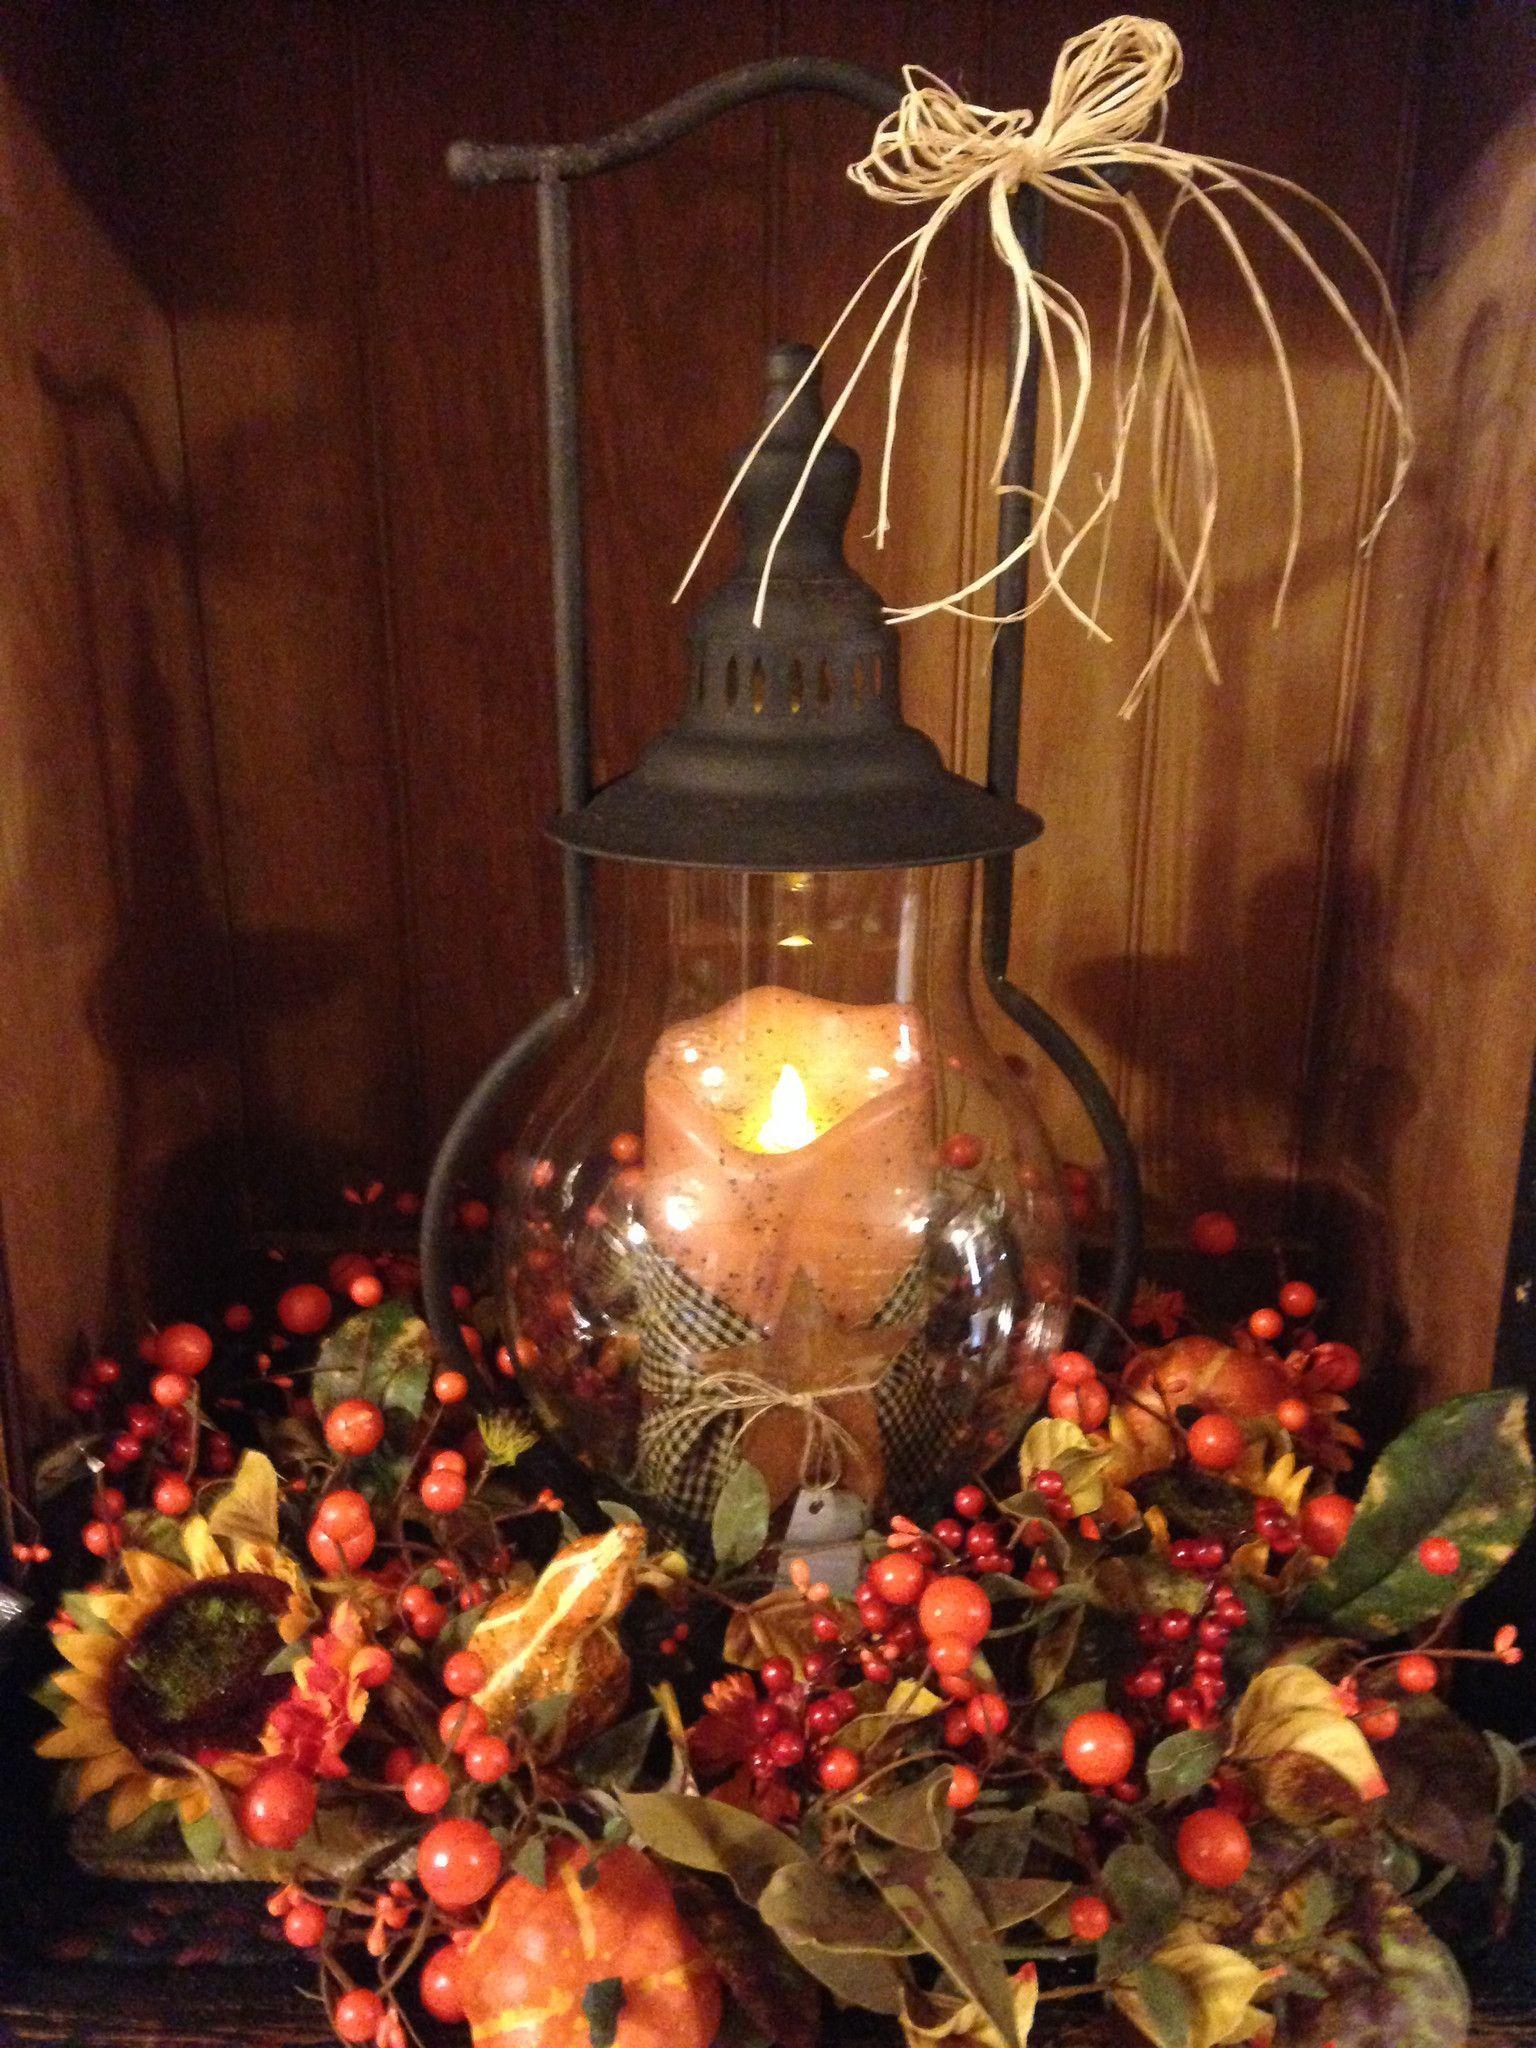 Steeple Lantern with Fall Arrangement